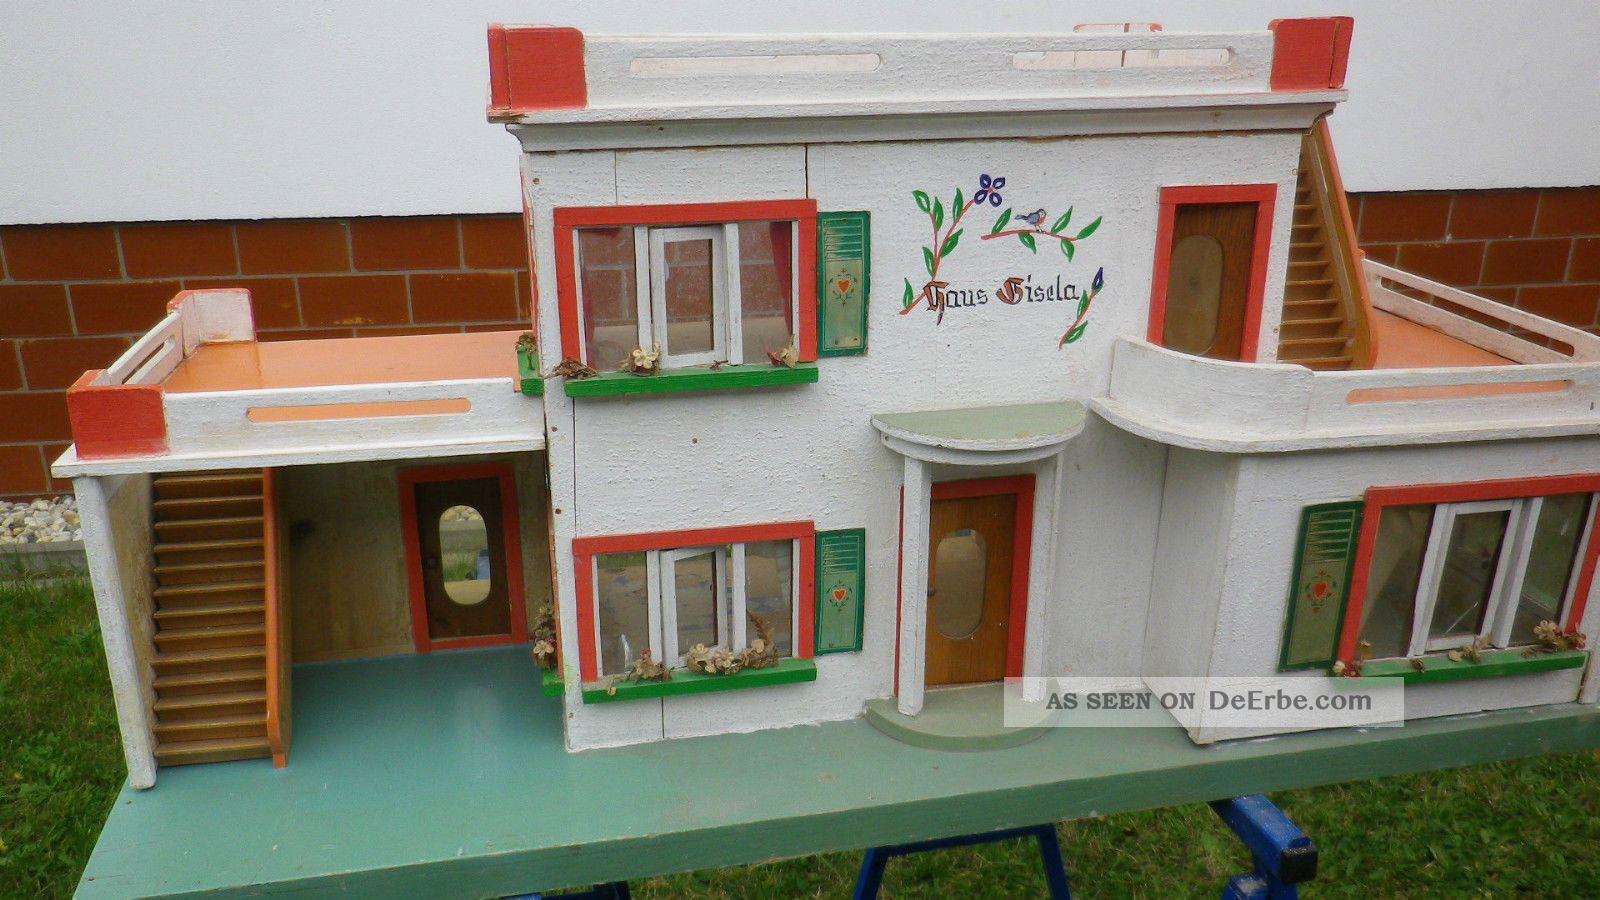 puppenhaus puppenstube ddr antik haus gisela albin sch nherr 50er jahre. Black Bedroom Furniture Sets. Home Design Ideas